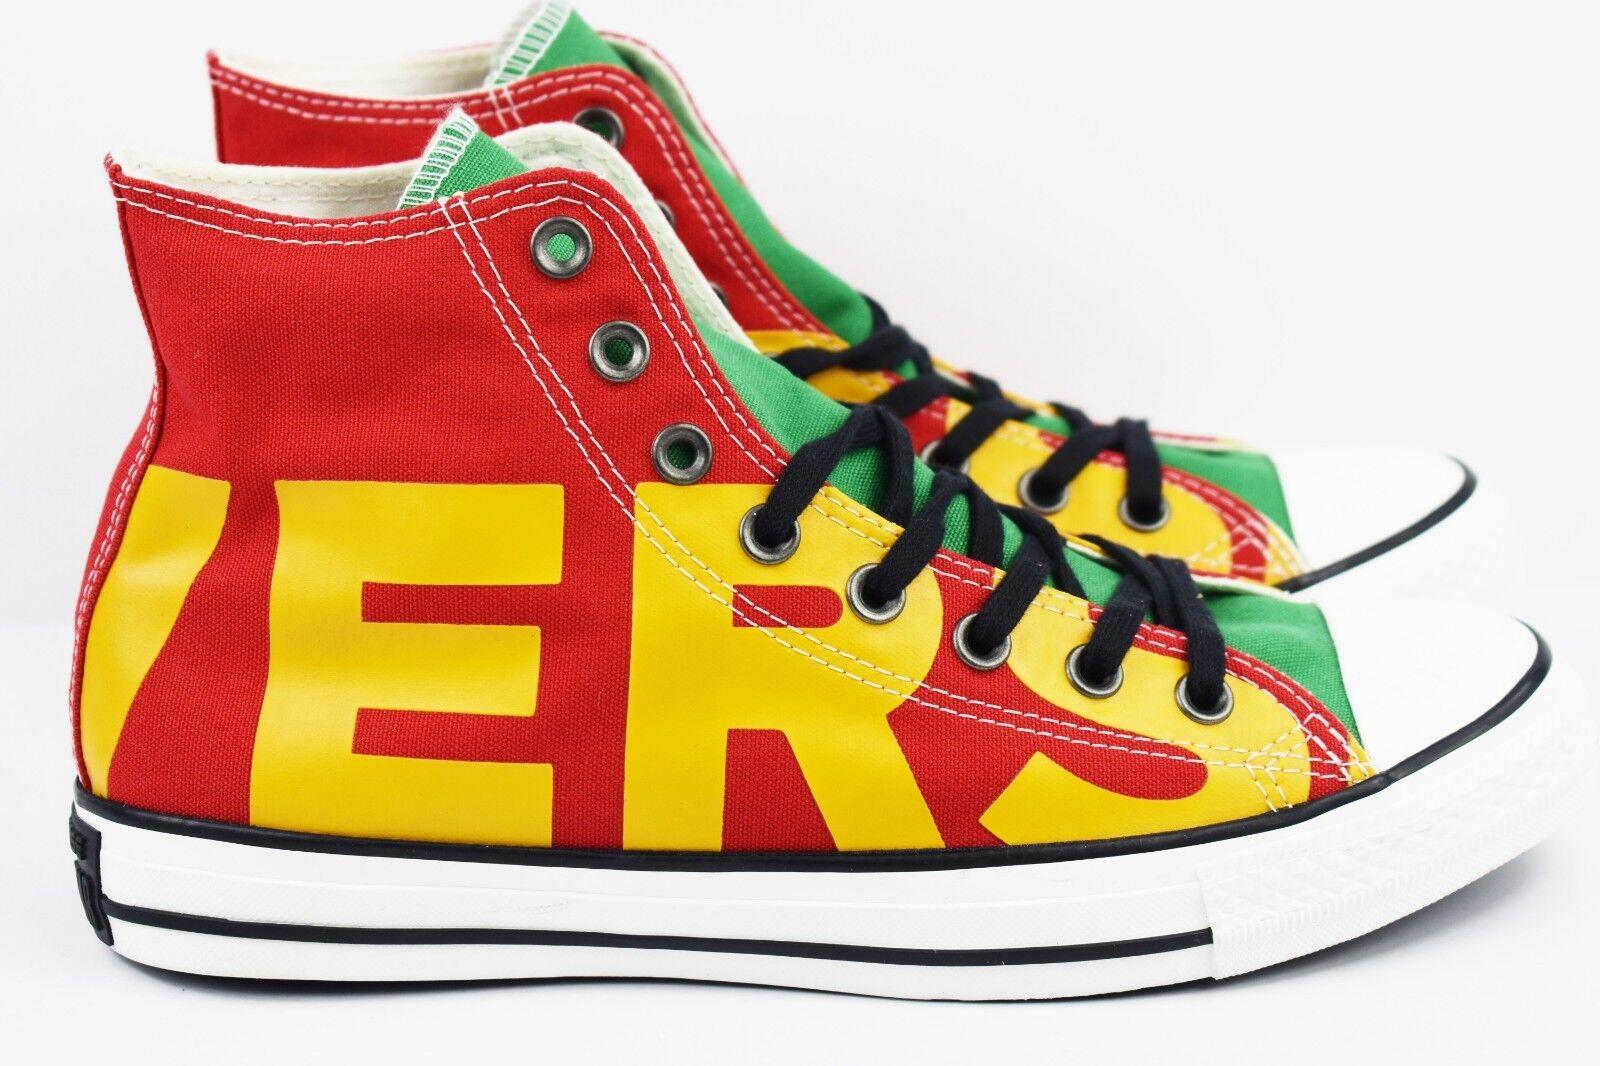 Converse Chuck Taylor All Star Wordmark Hi CTAS Uomo Multi Taglia 159534F Red